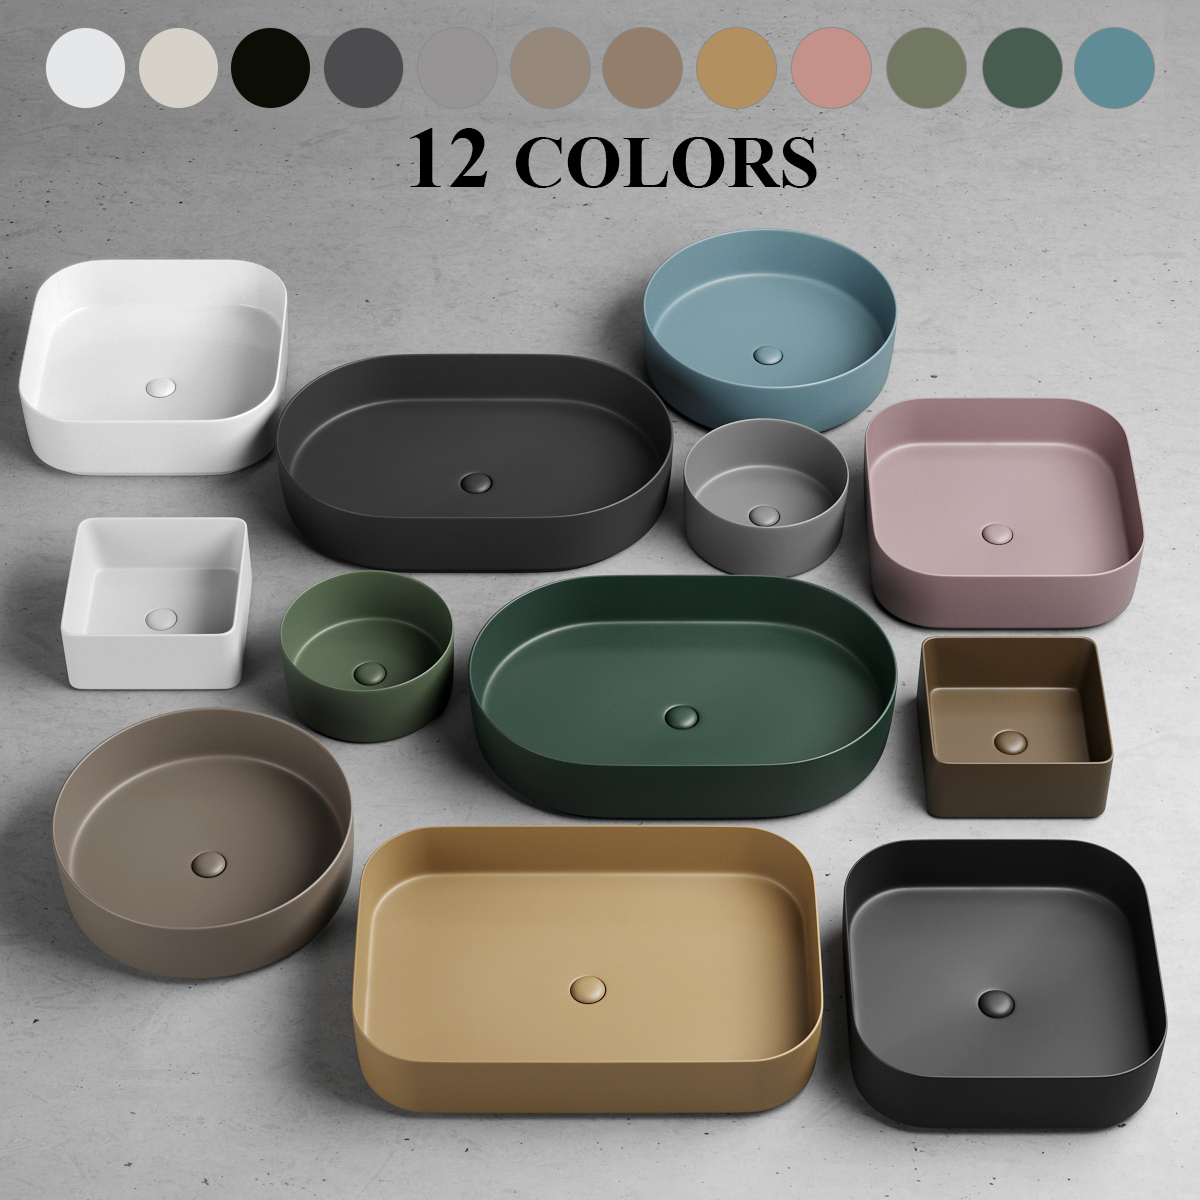 Ceramica Cielo Lavabo Shui.Lavabi Ceramica Cielo Shui Comfort